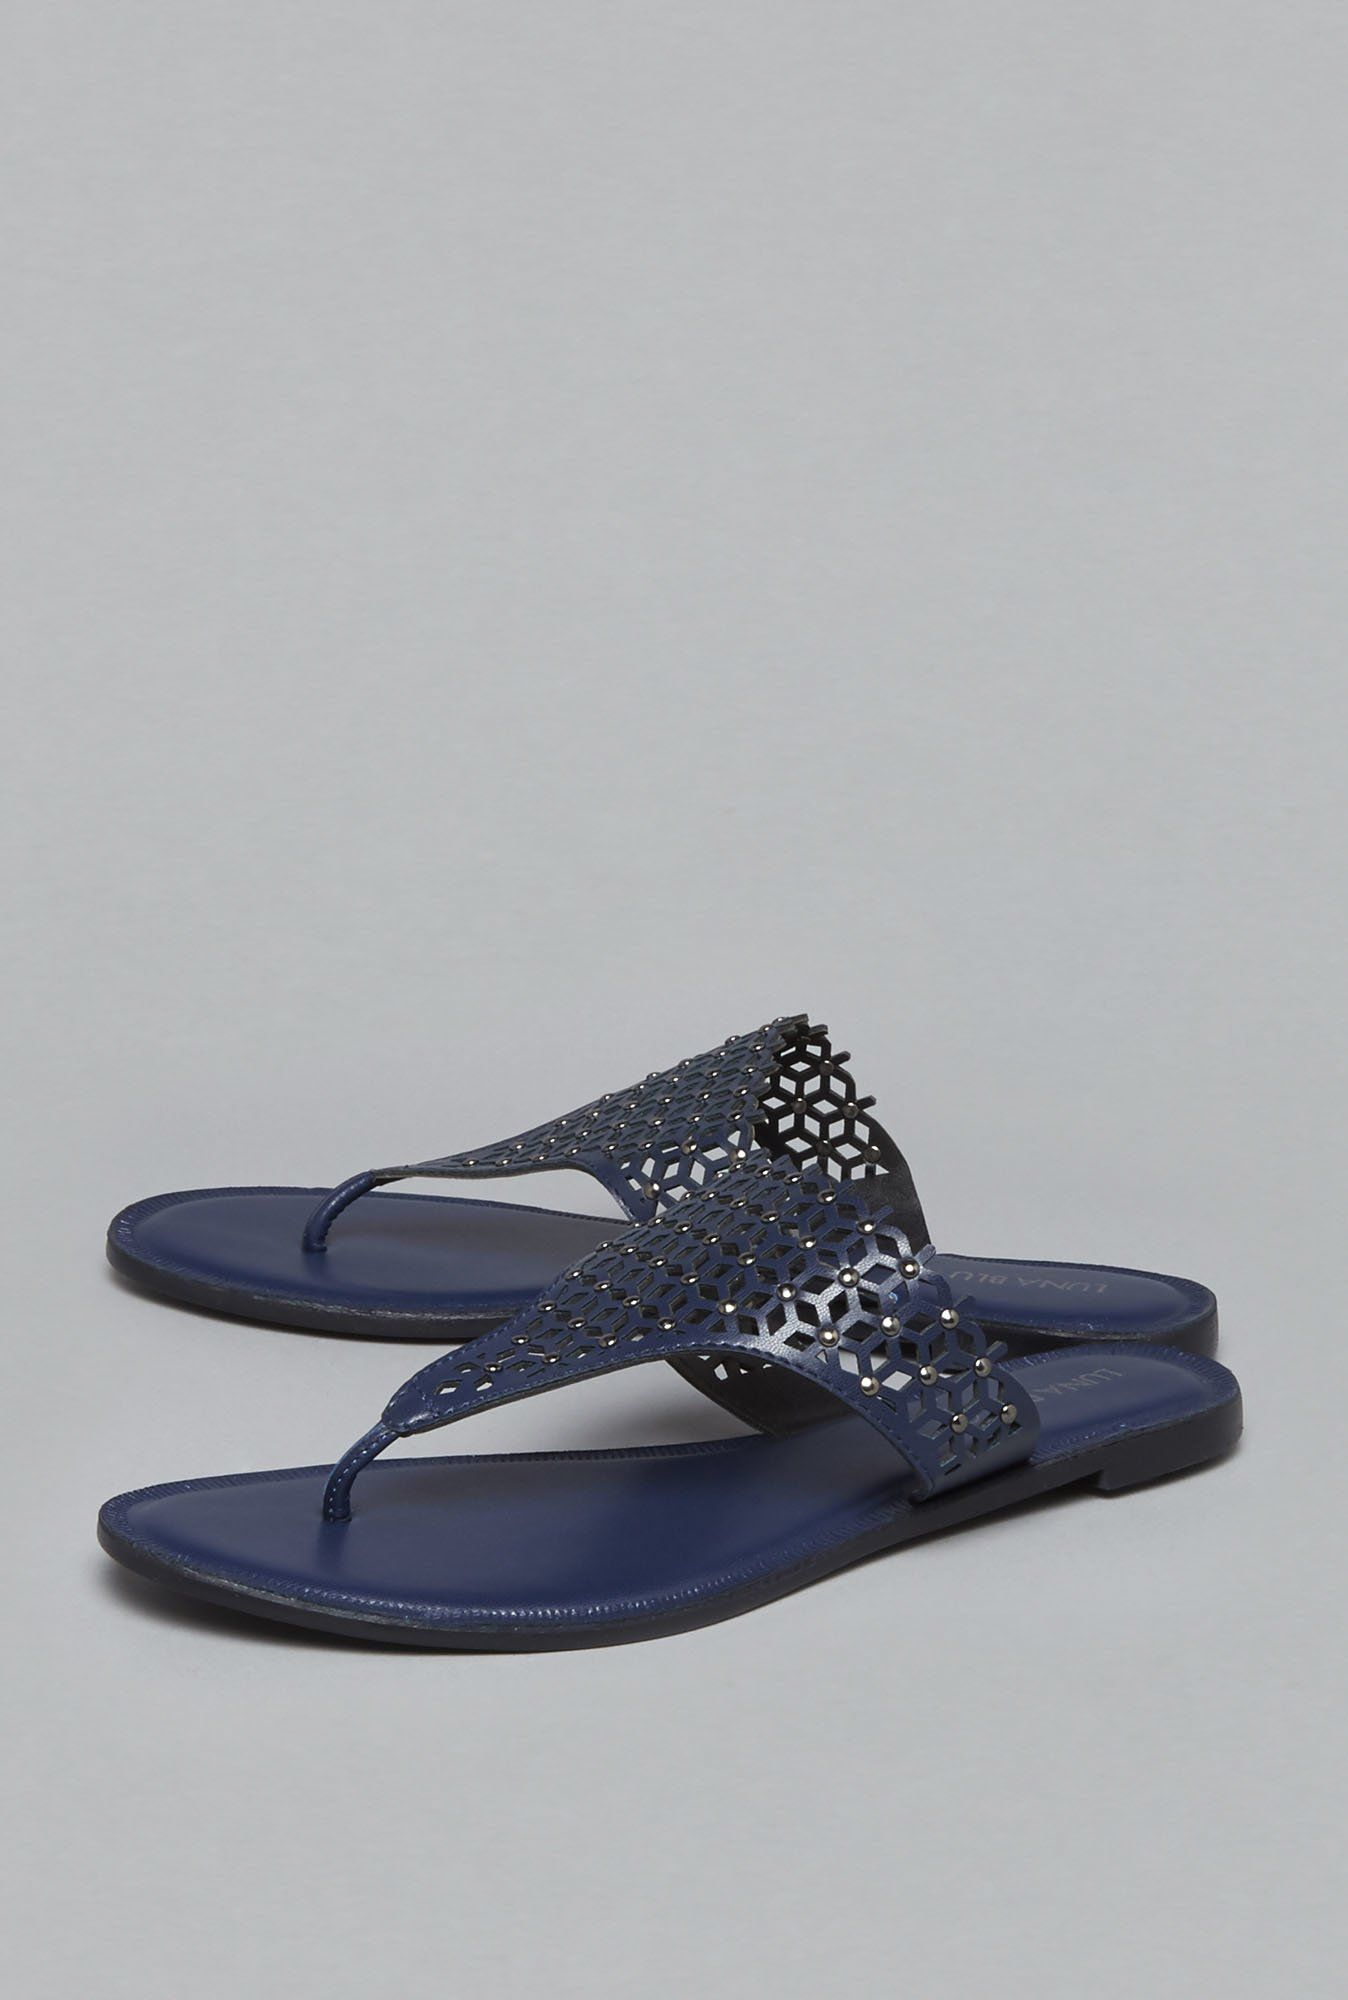 ad72041ec69 LUNA BLU by Westside Navy Sandals